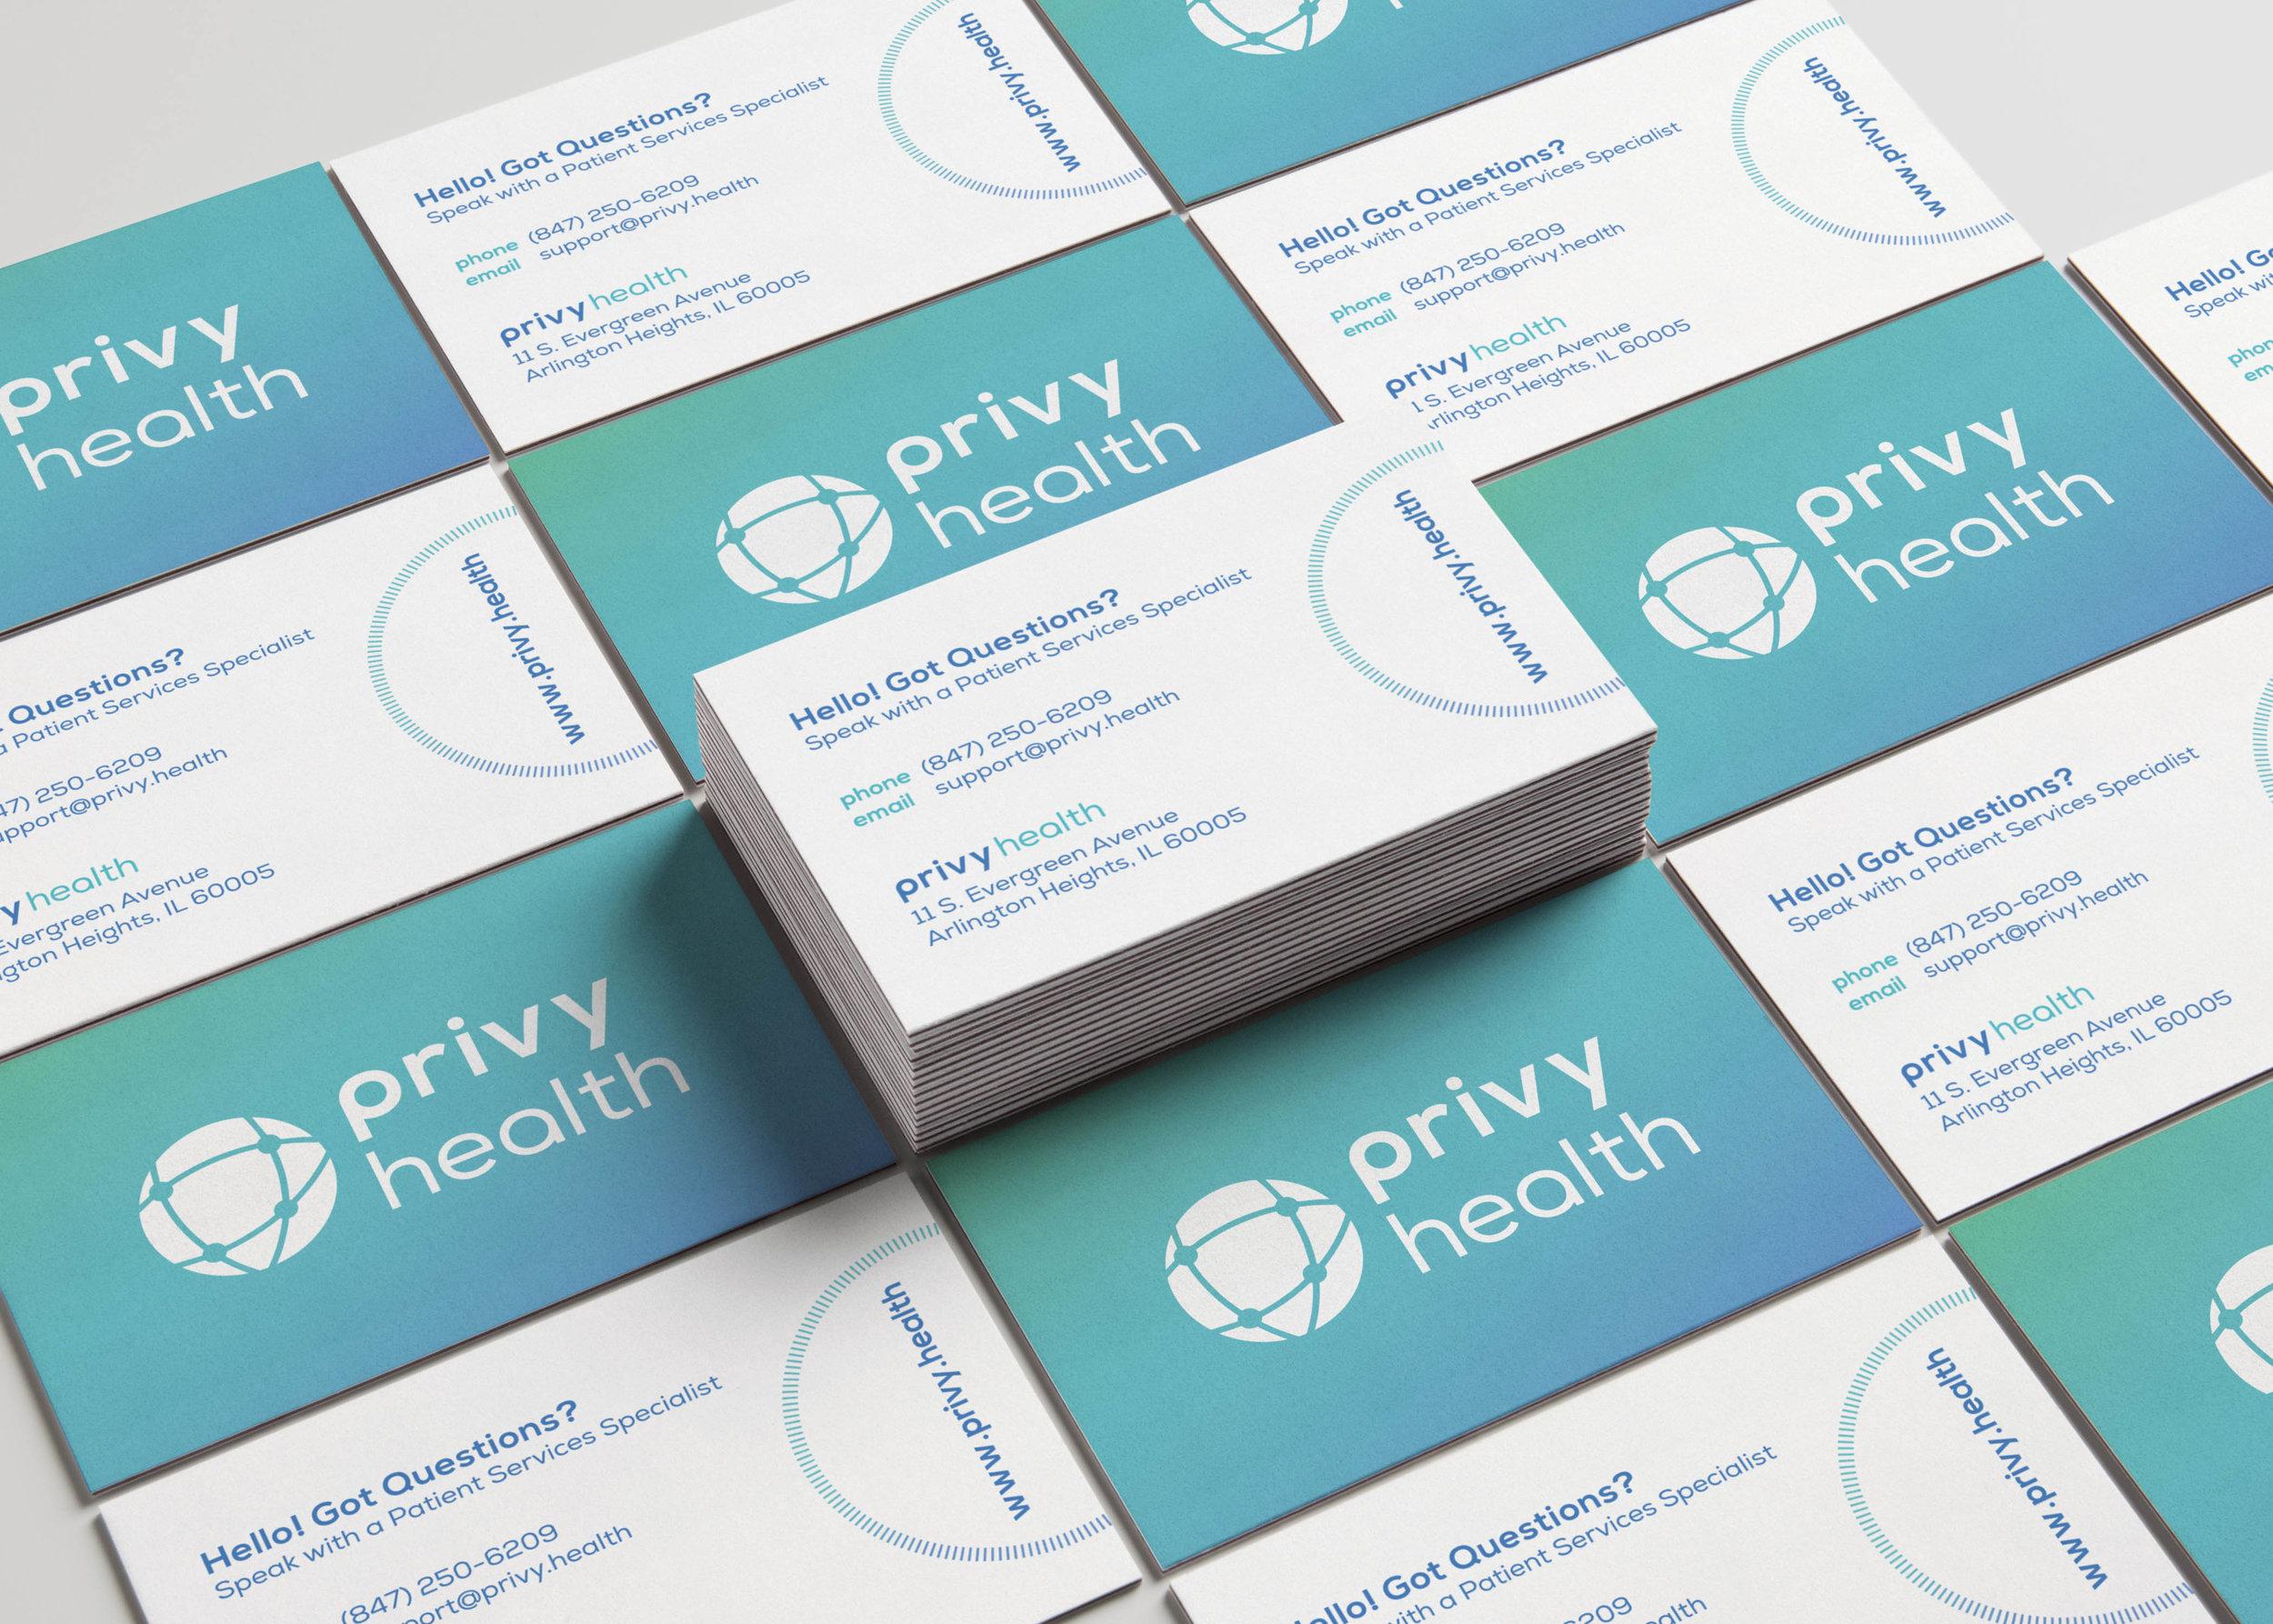 Perspective Business Cards MockUp 2_privy.jpg